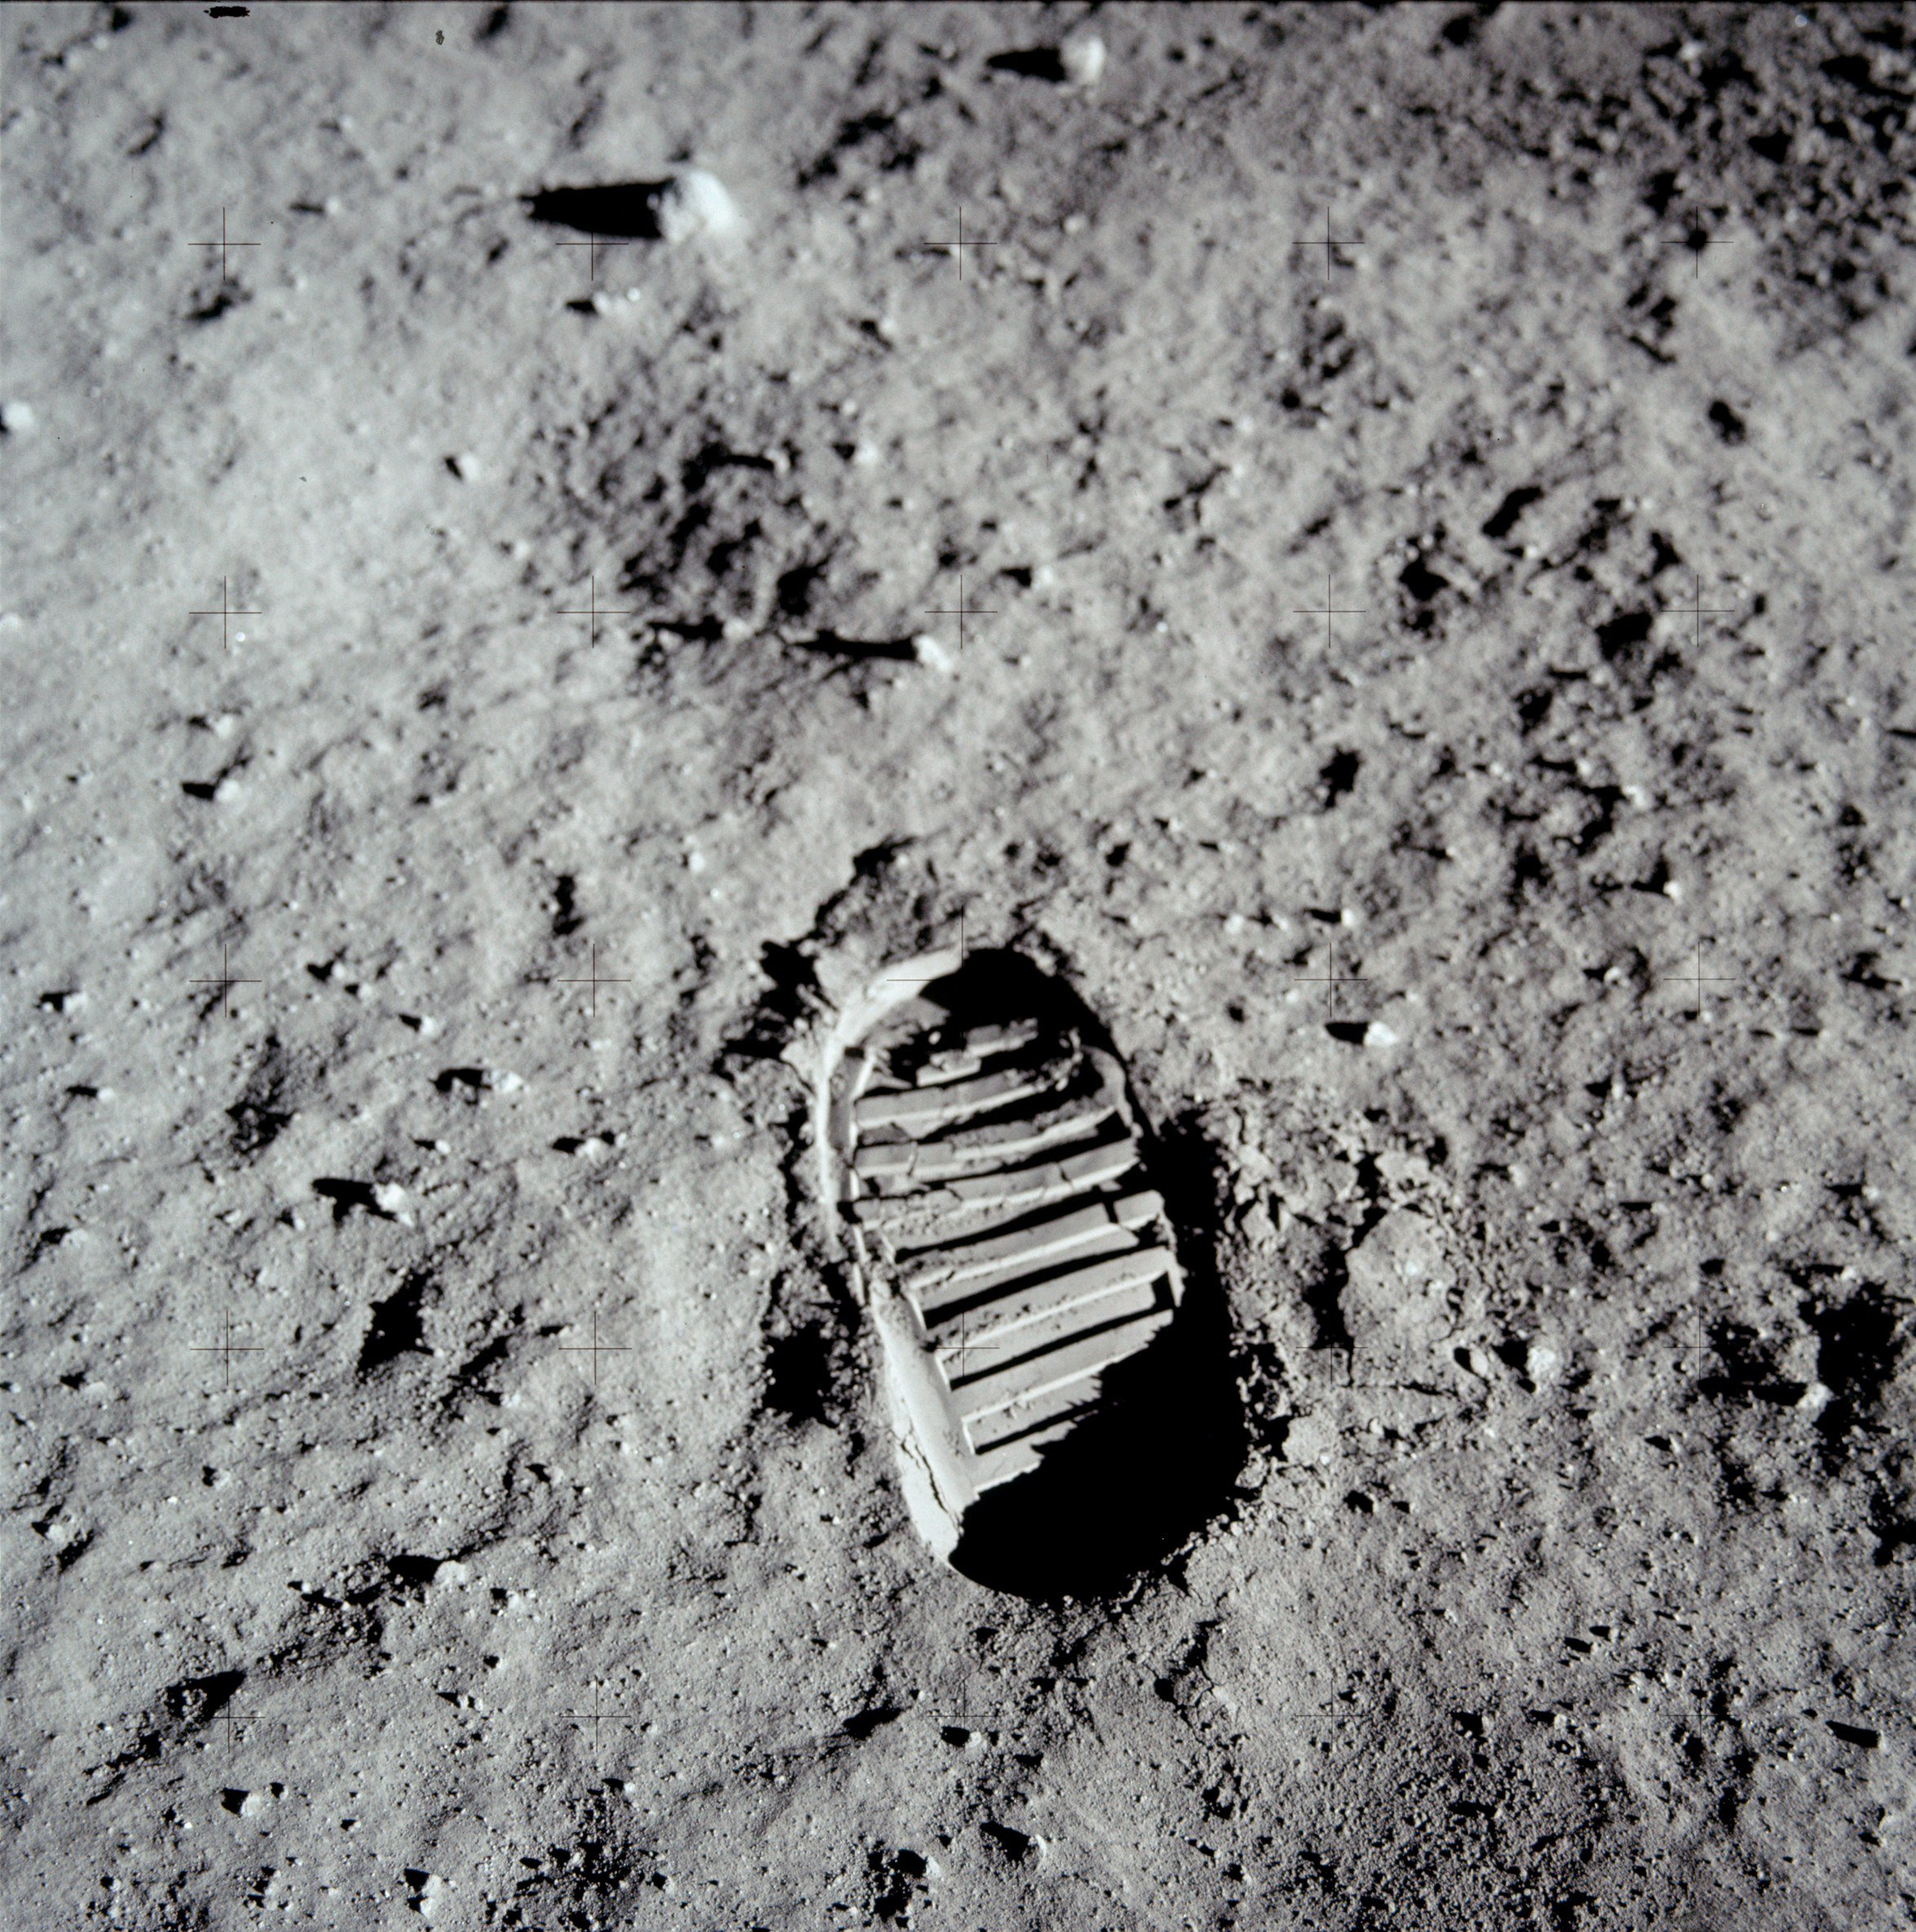 Buzz Aldrin's Bootprint